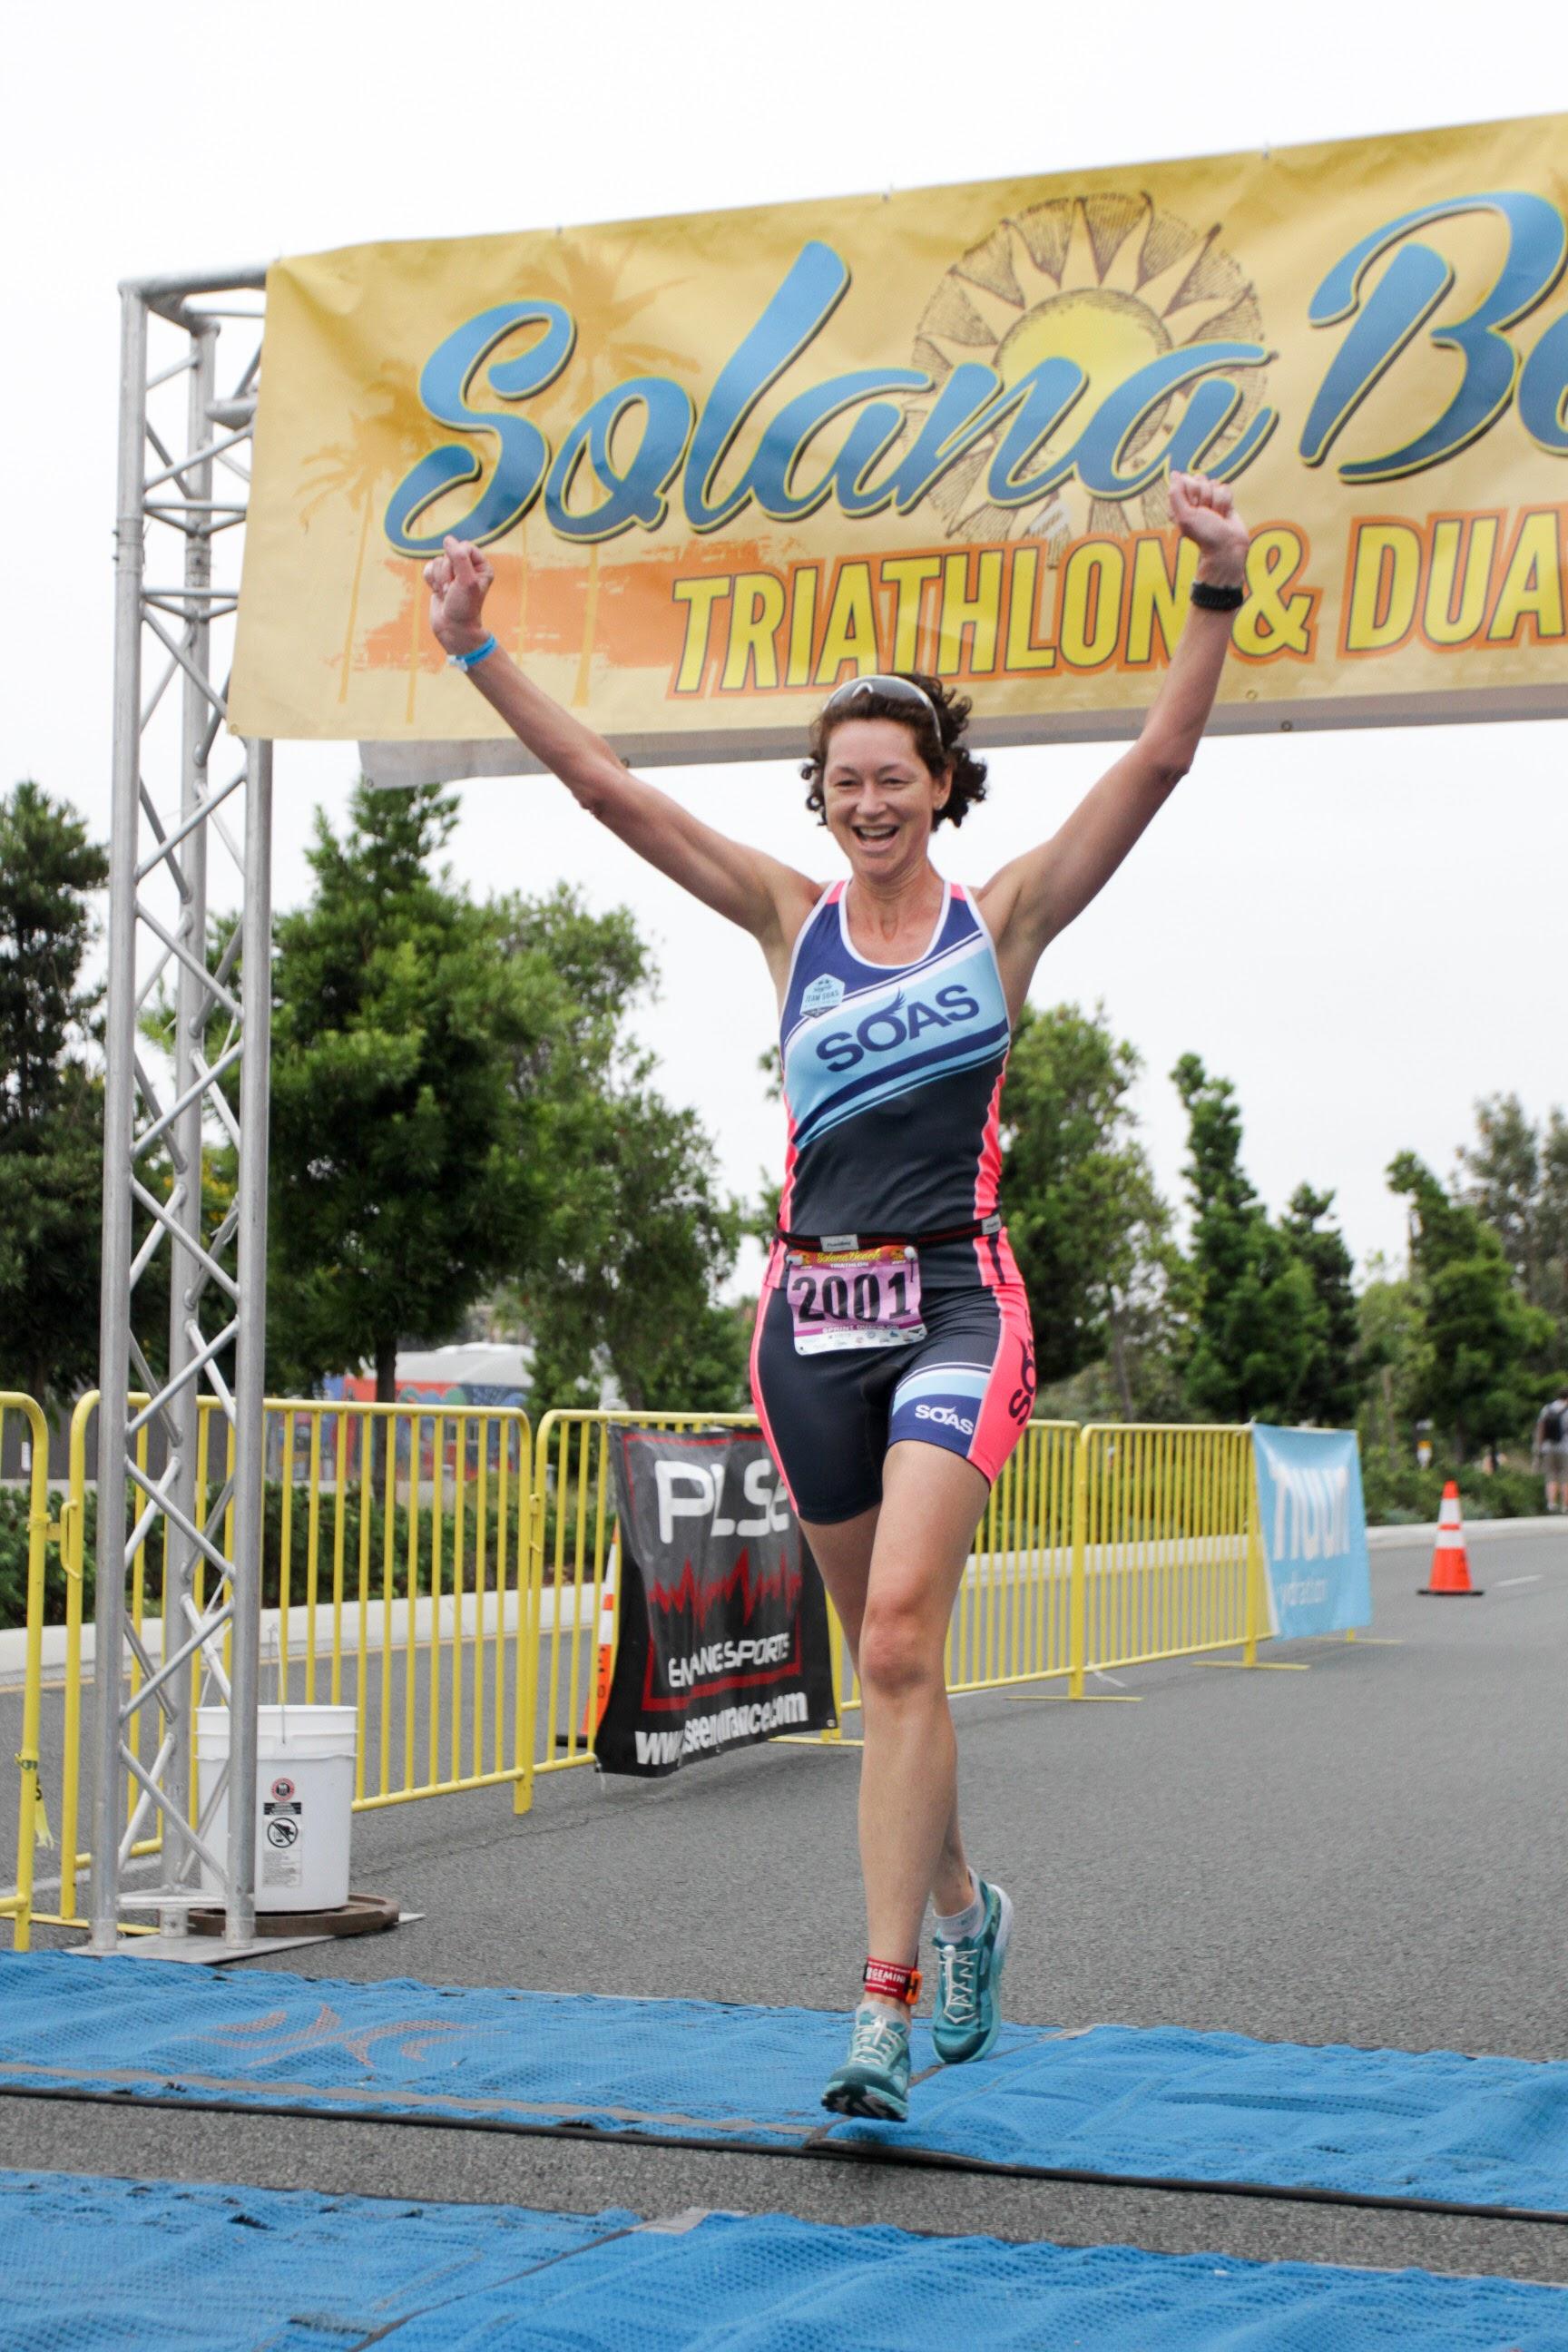 2019 Solana Beach Triathlon - Solana Beach, CA 2019 | ACTIVE